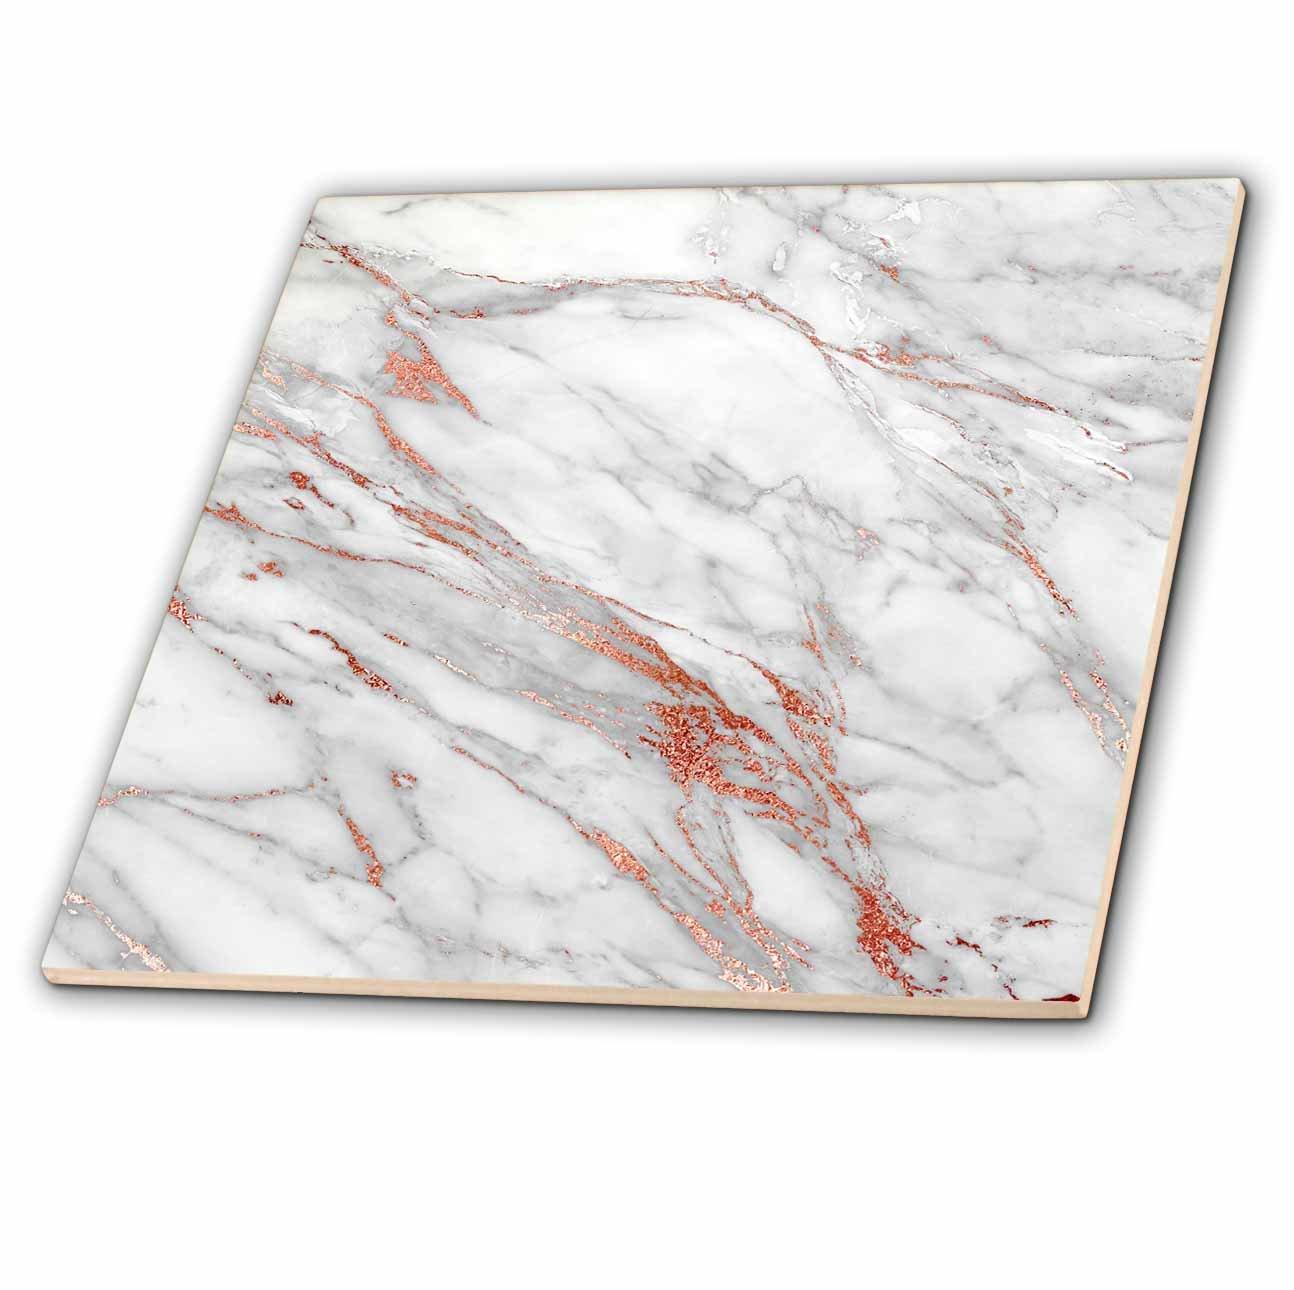 3dRose ct_268836_1 Luxury Grey Copper Gem Stone Marble Glitter Metallic Faux Print Ceramic Tiles, by 3dRose (Image #1)